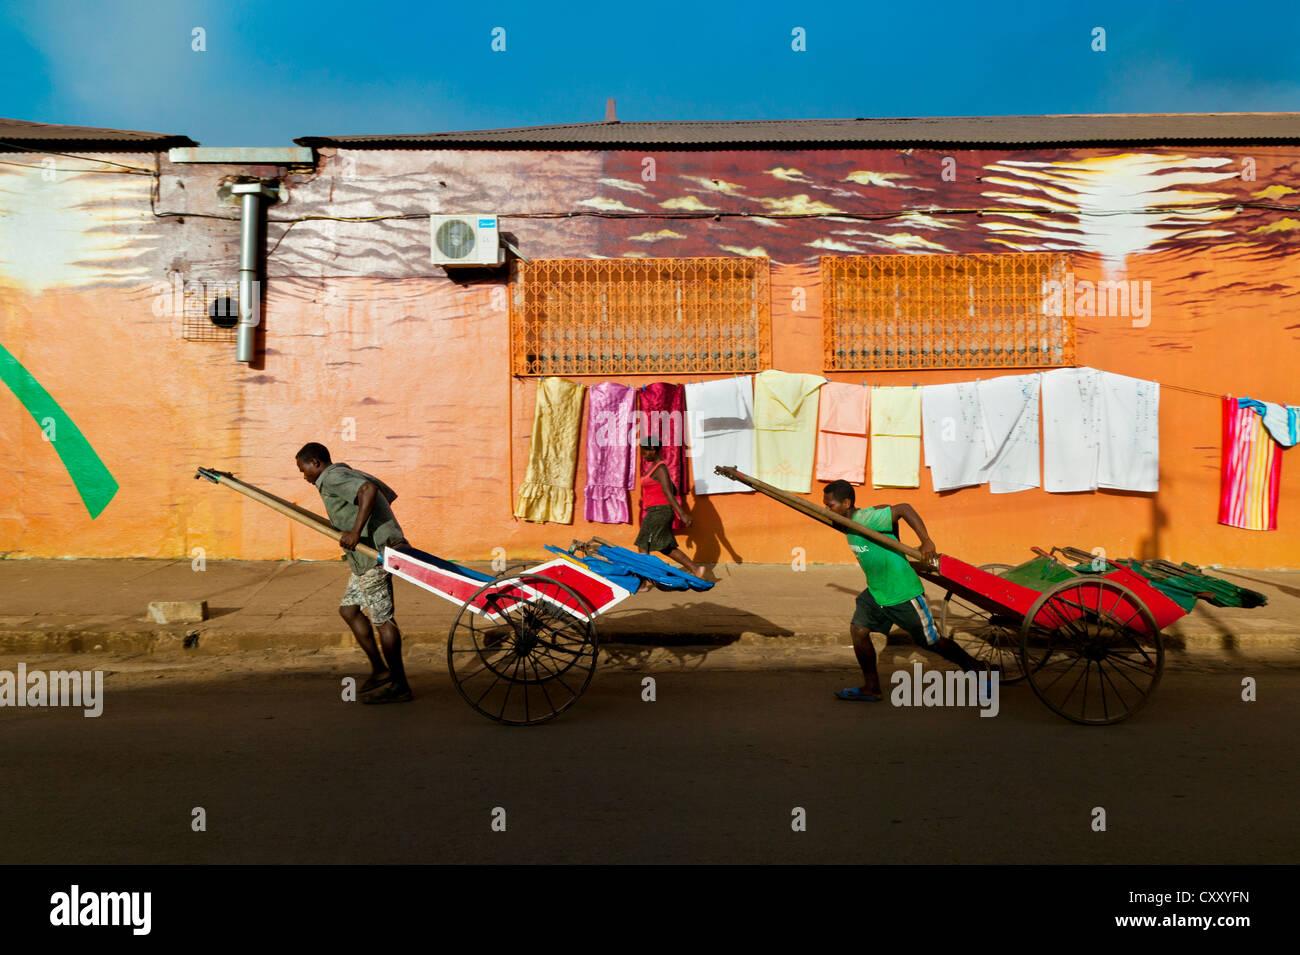 Lafayette Sreet,Diego Suarez, Madagascar - Stock Image